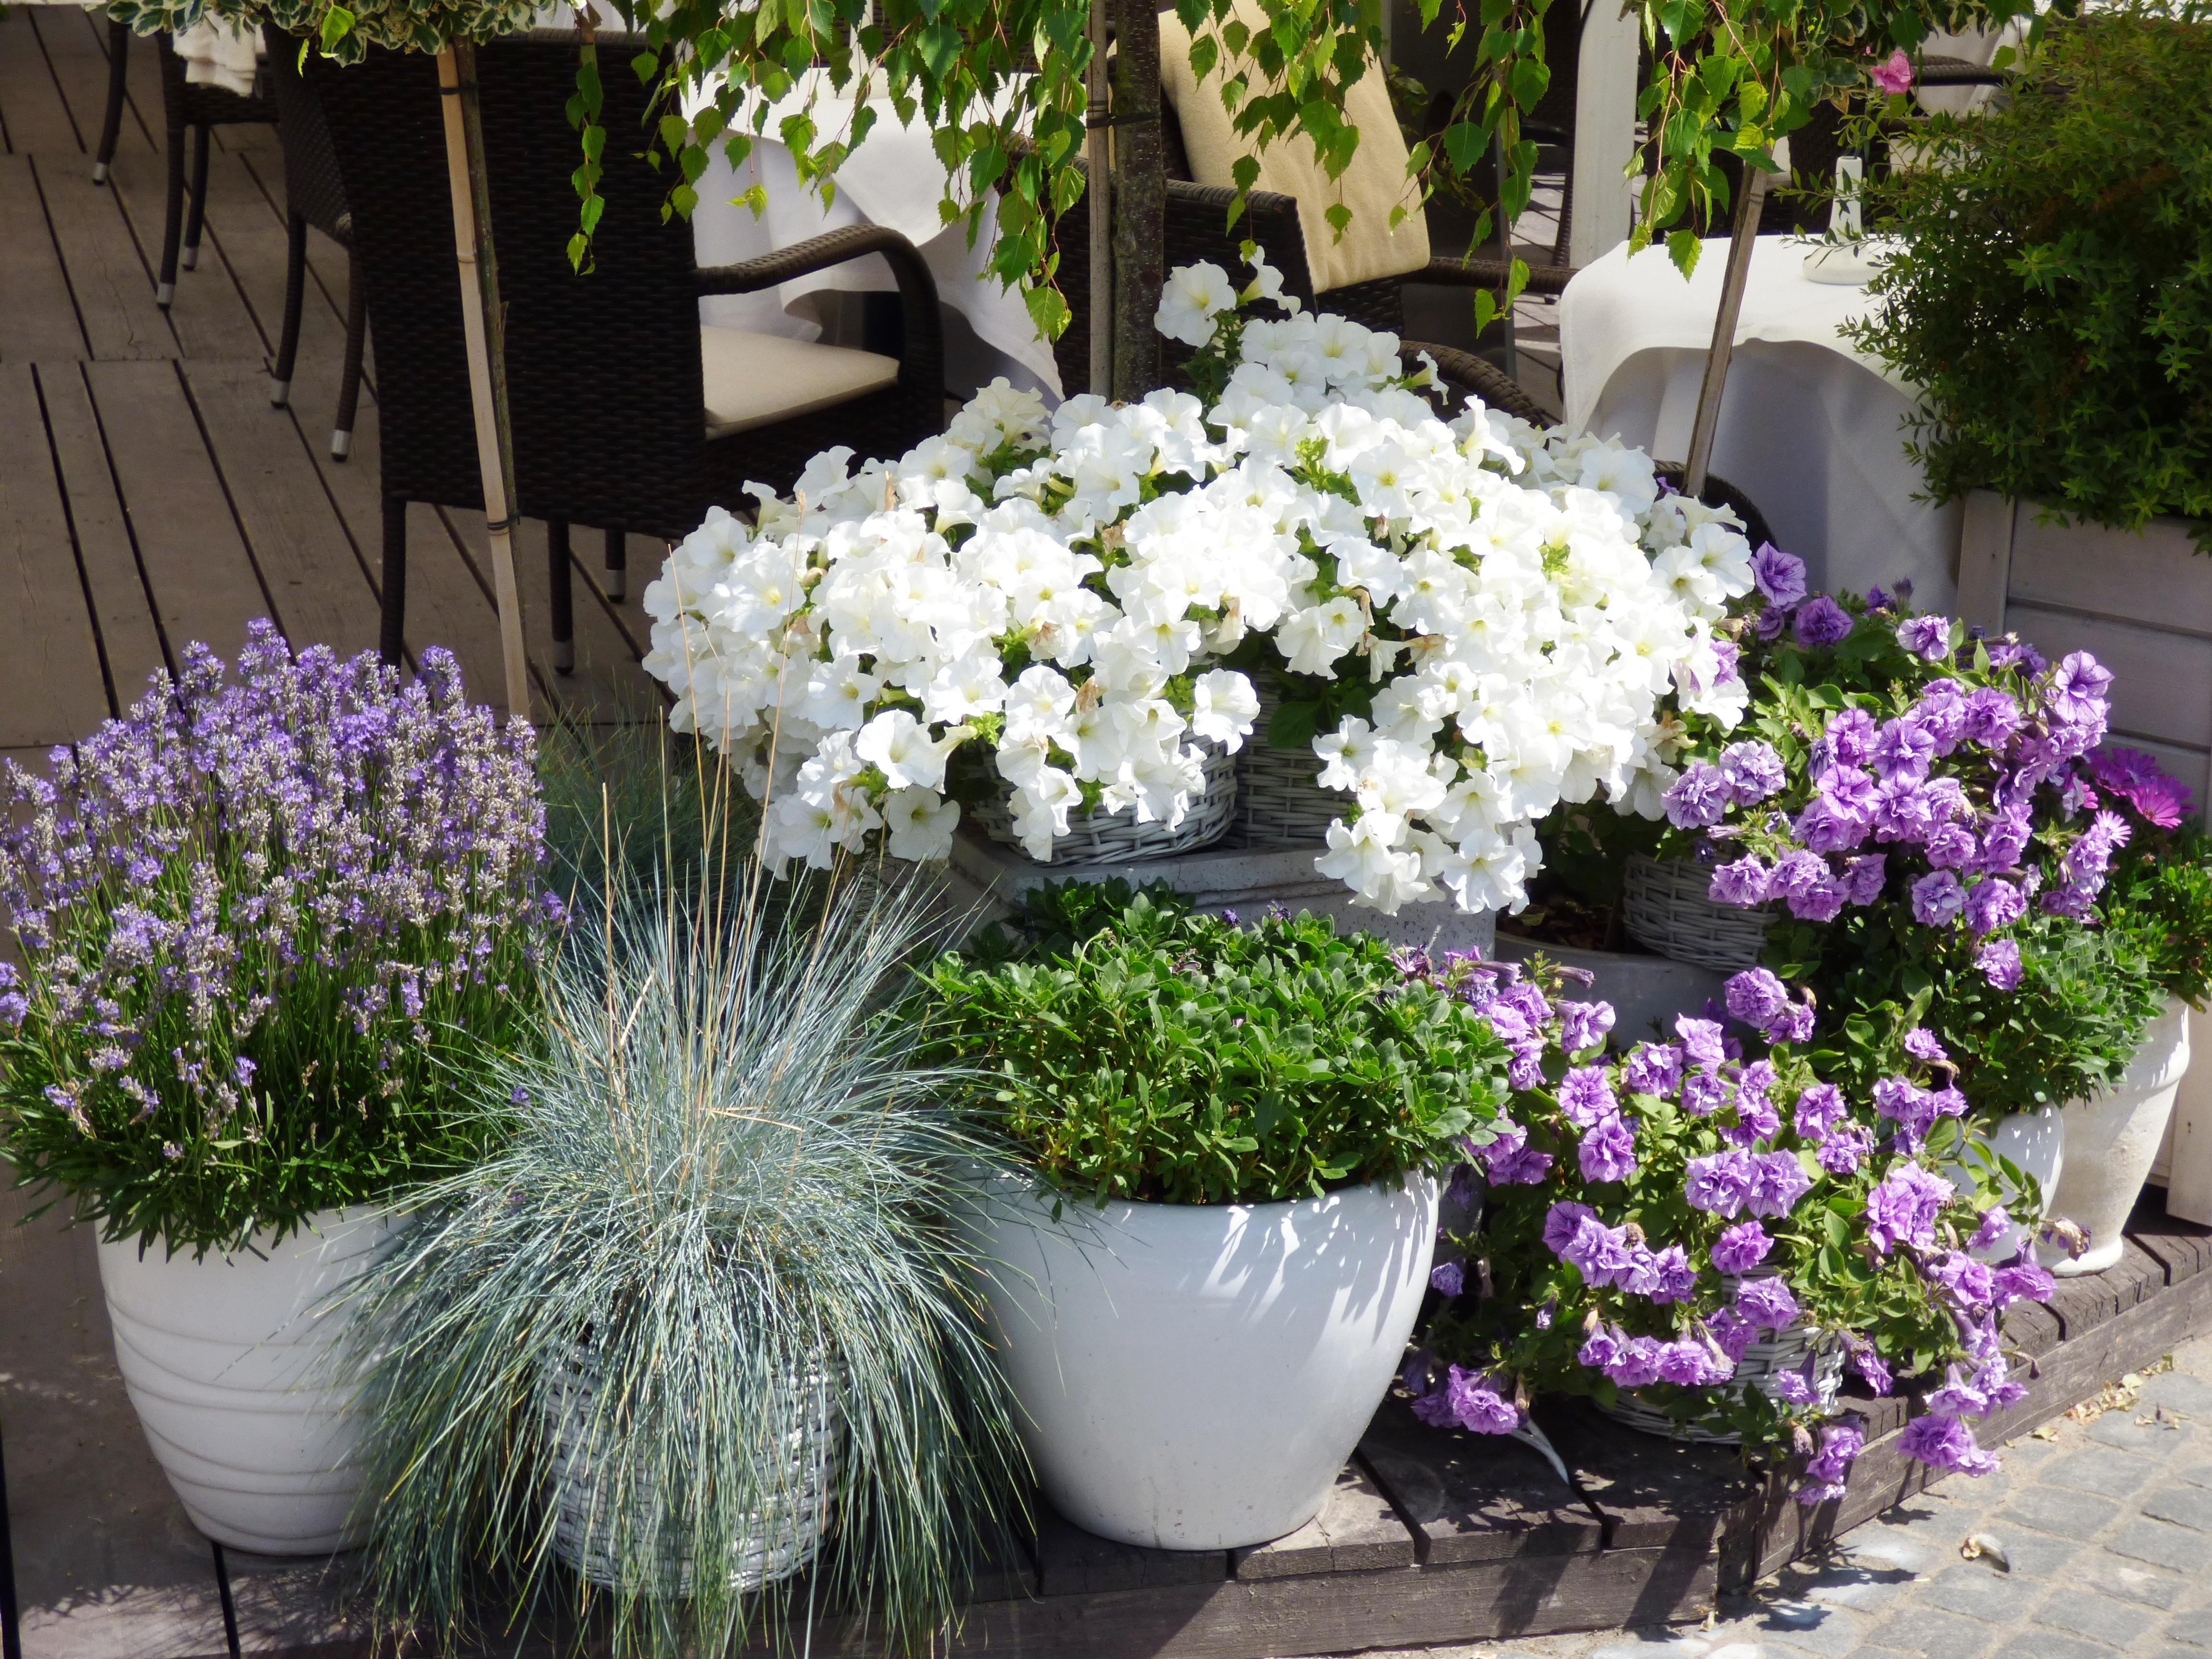 Free Images : nature, backyard, garden, flora, hydrangea ...